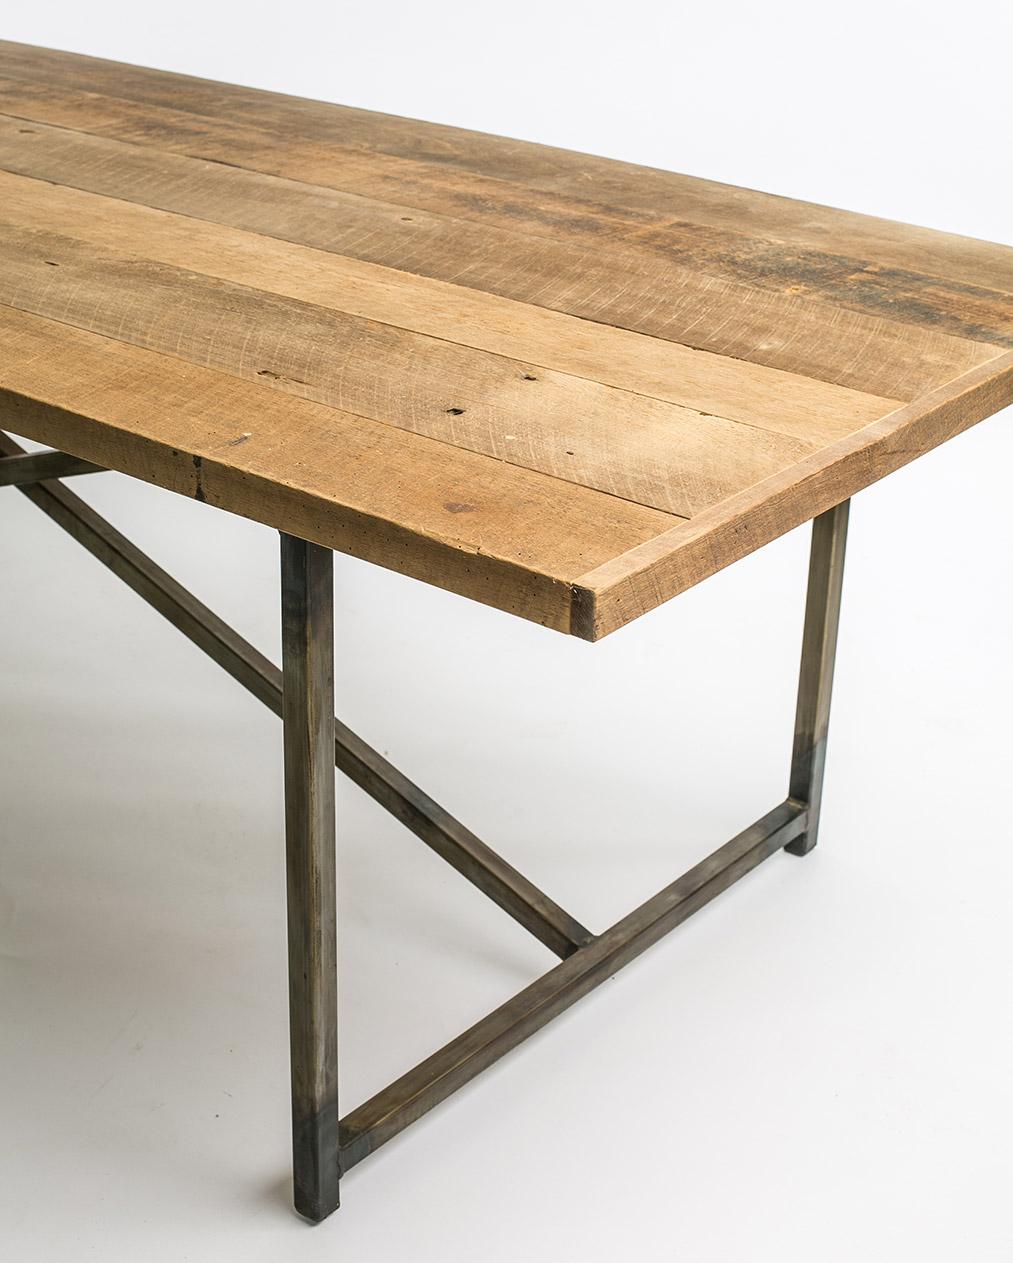 Barn Lumber Top with Metal Base